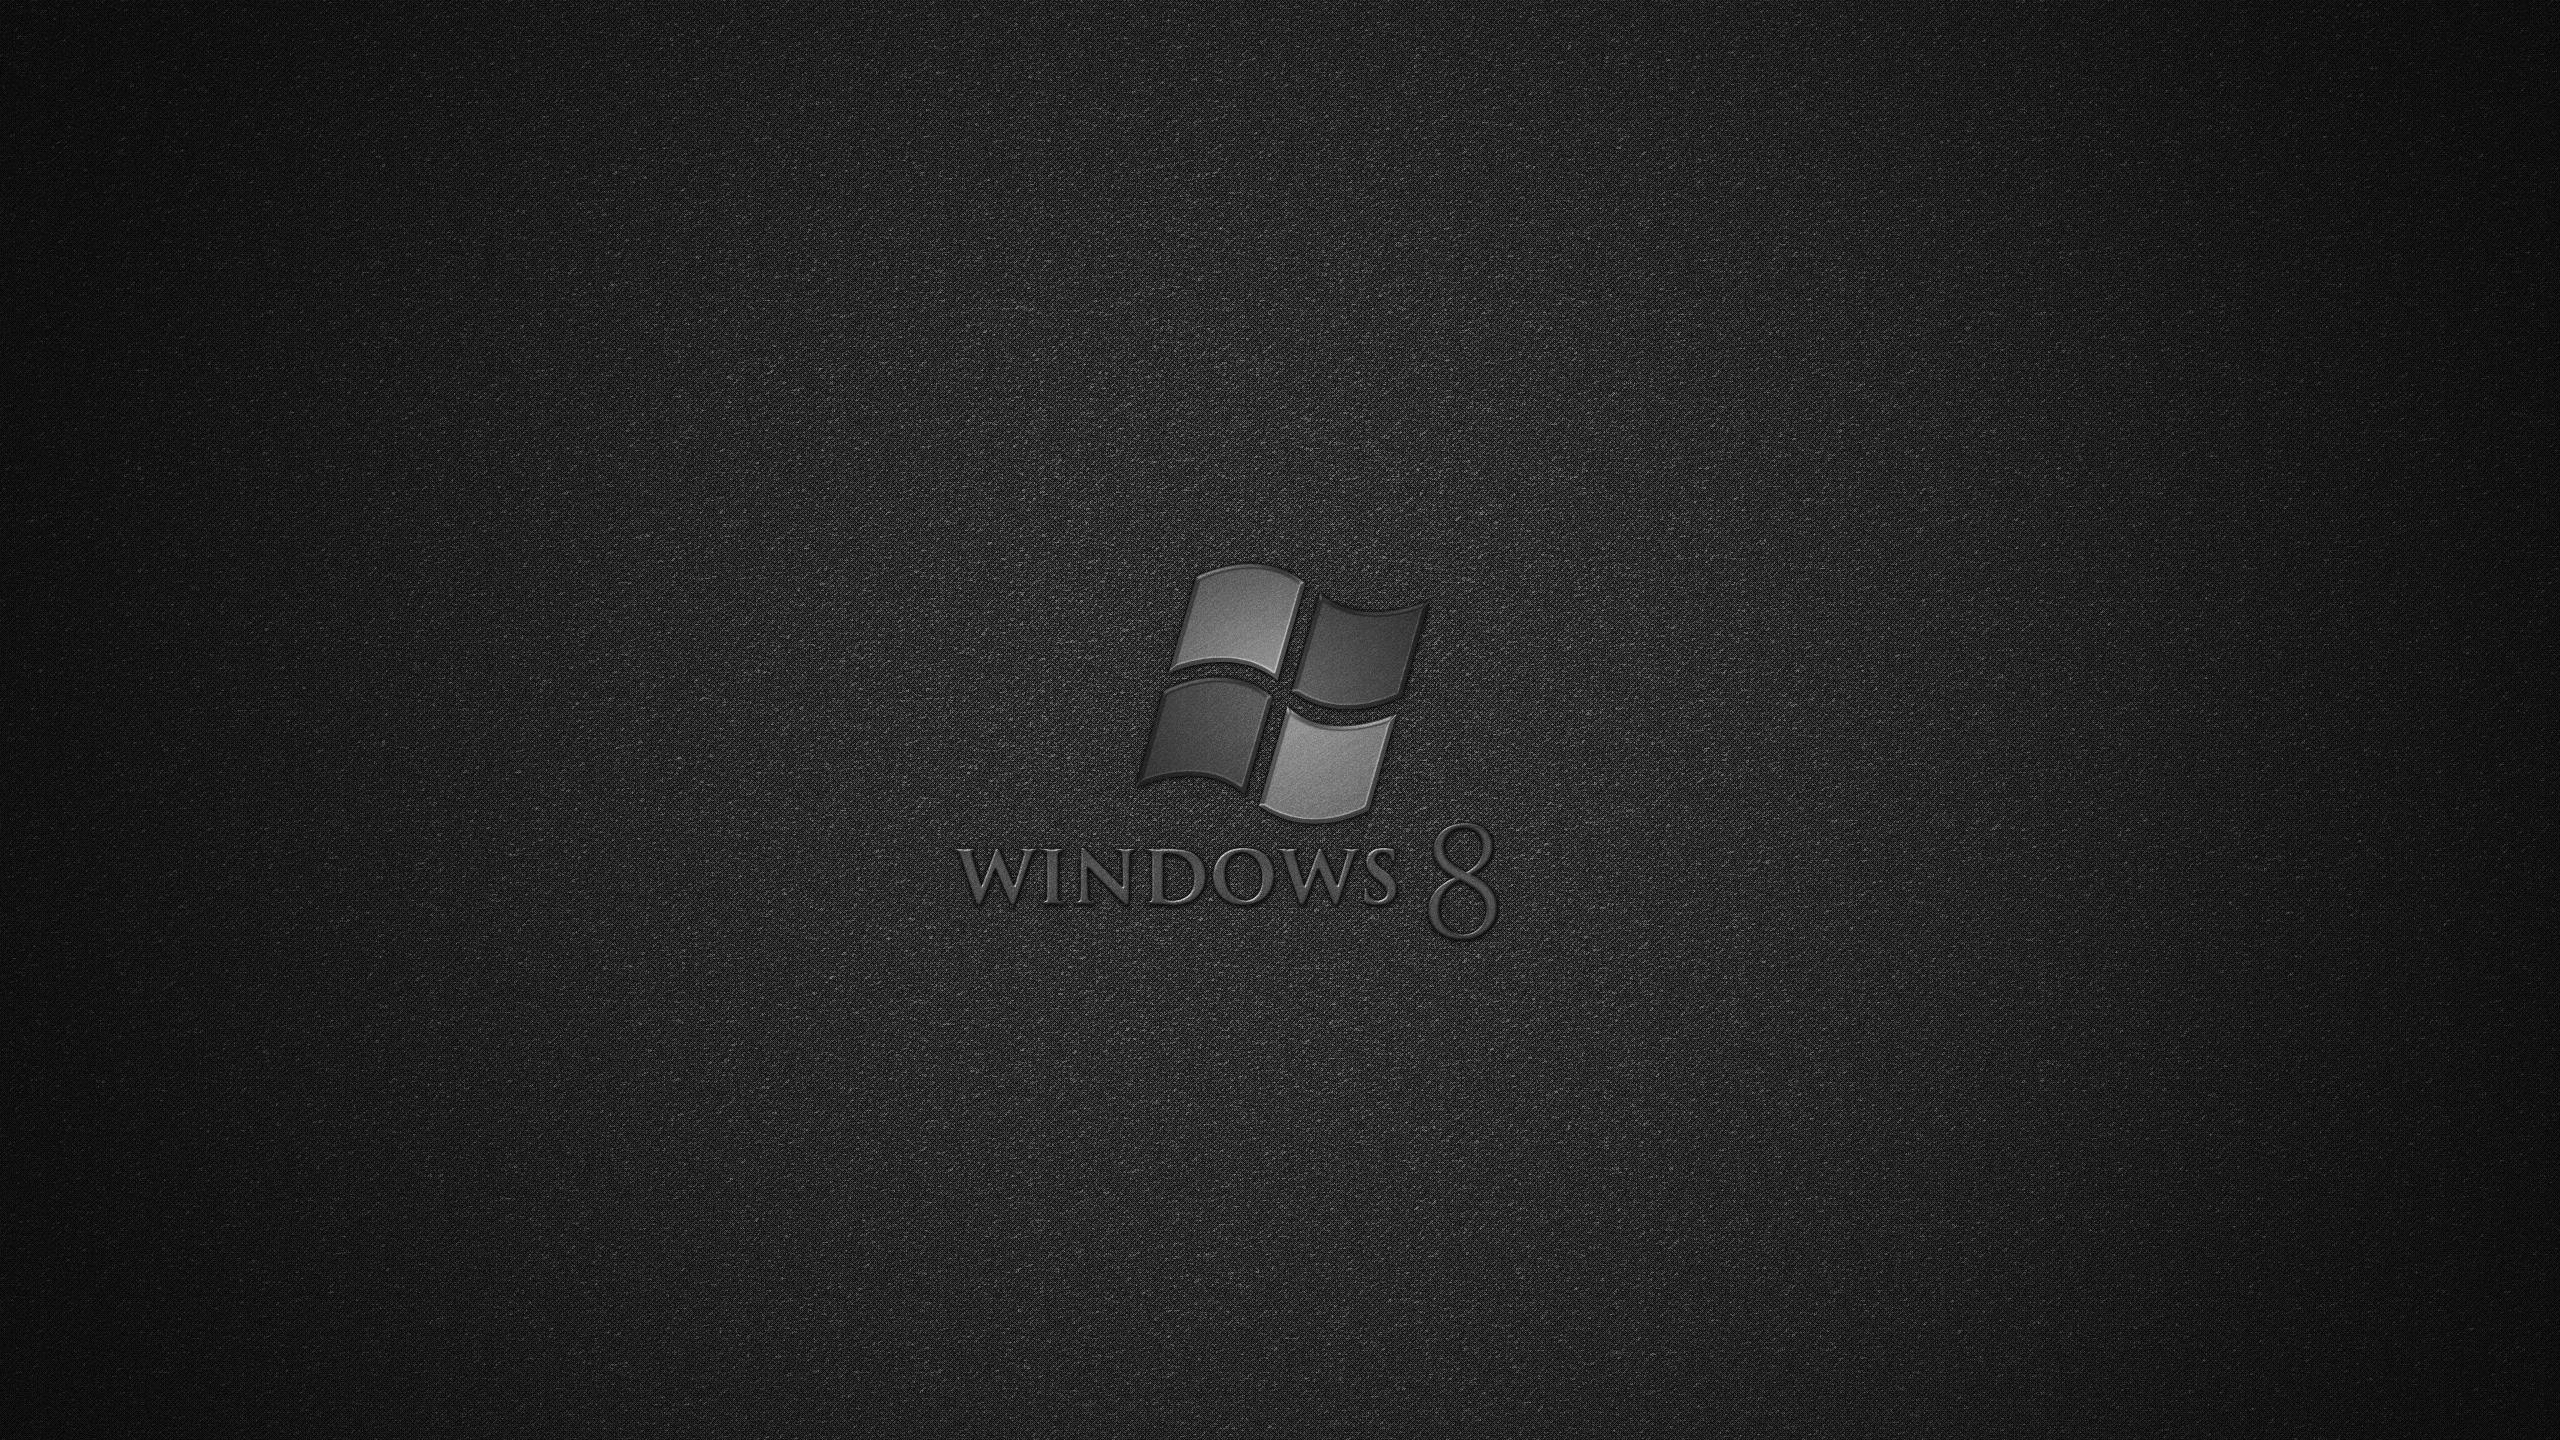 2560x1440 Wallpaper Windows Black Background Screen Saver ALHOMAT 2560x1440